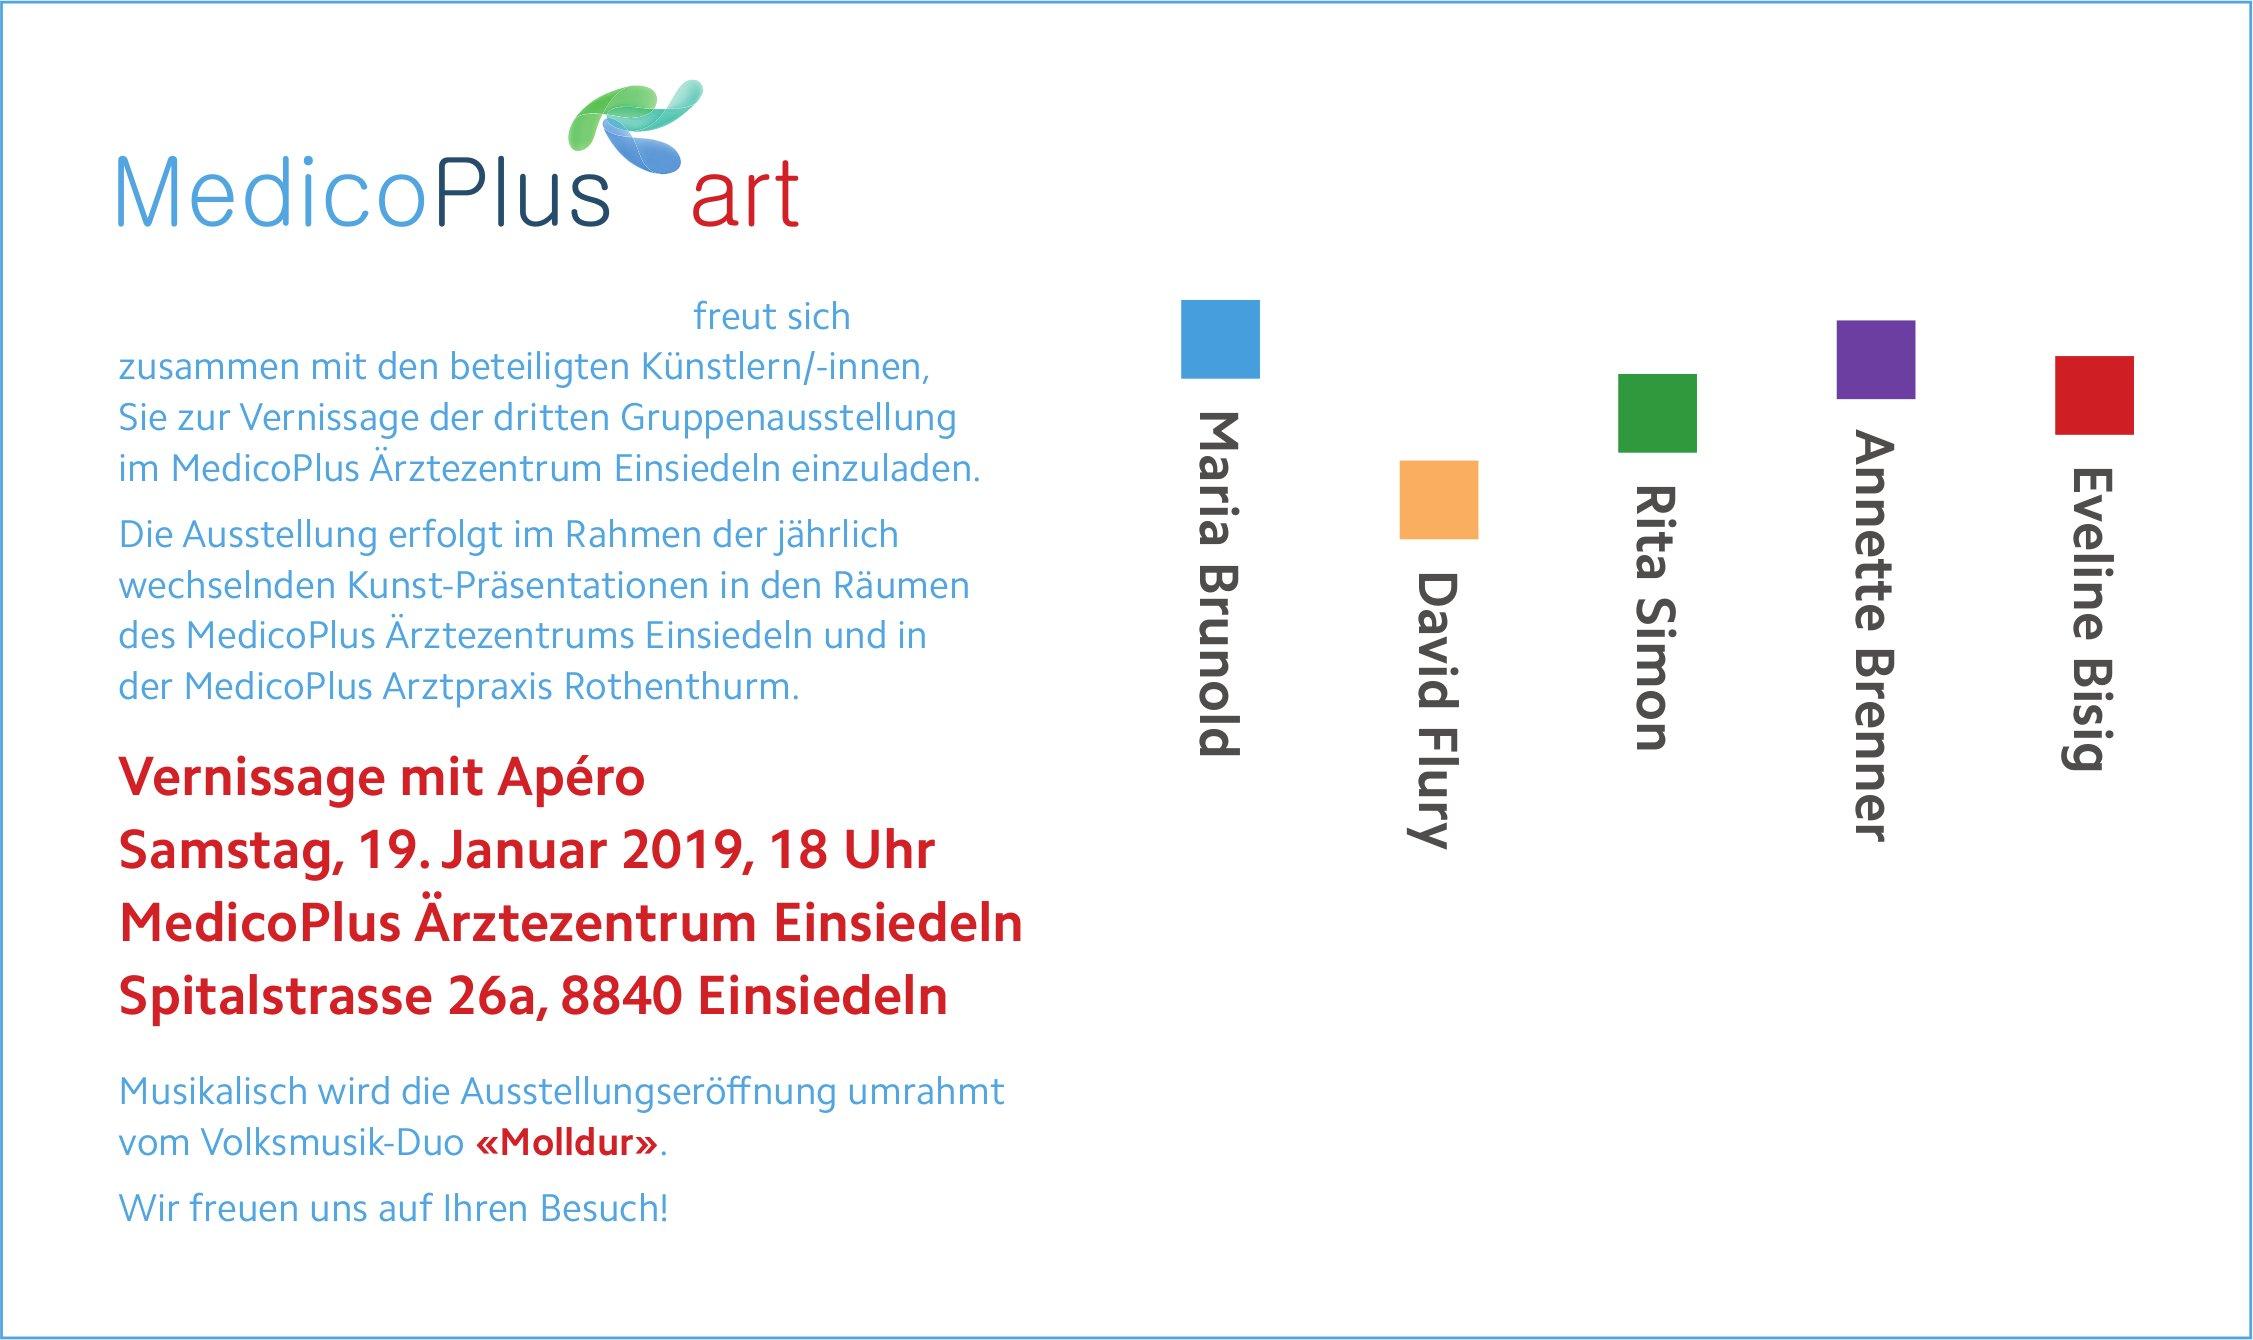 MedicoPlus art - Vernissage mit Apéro, 19. Jan.